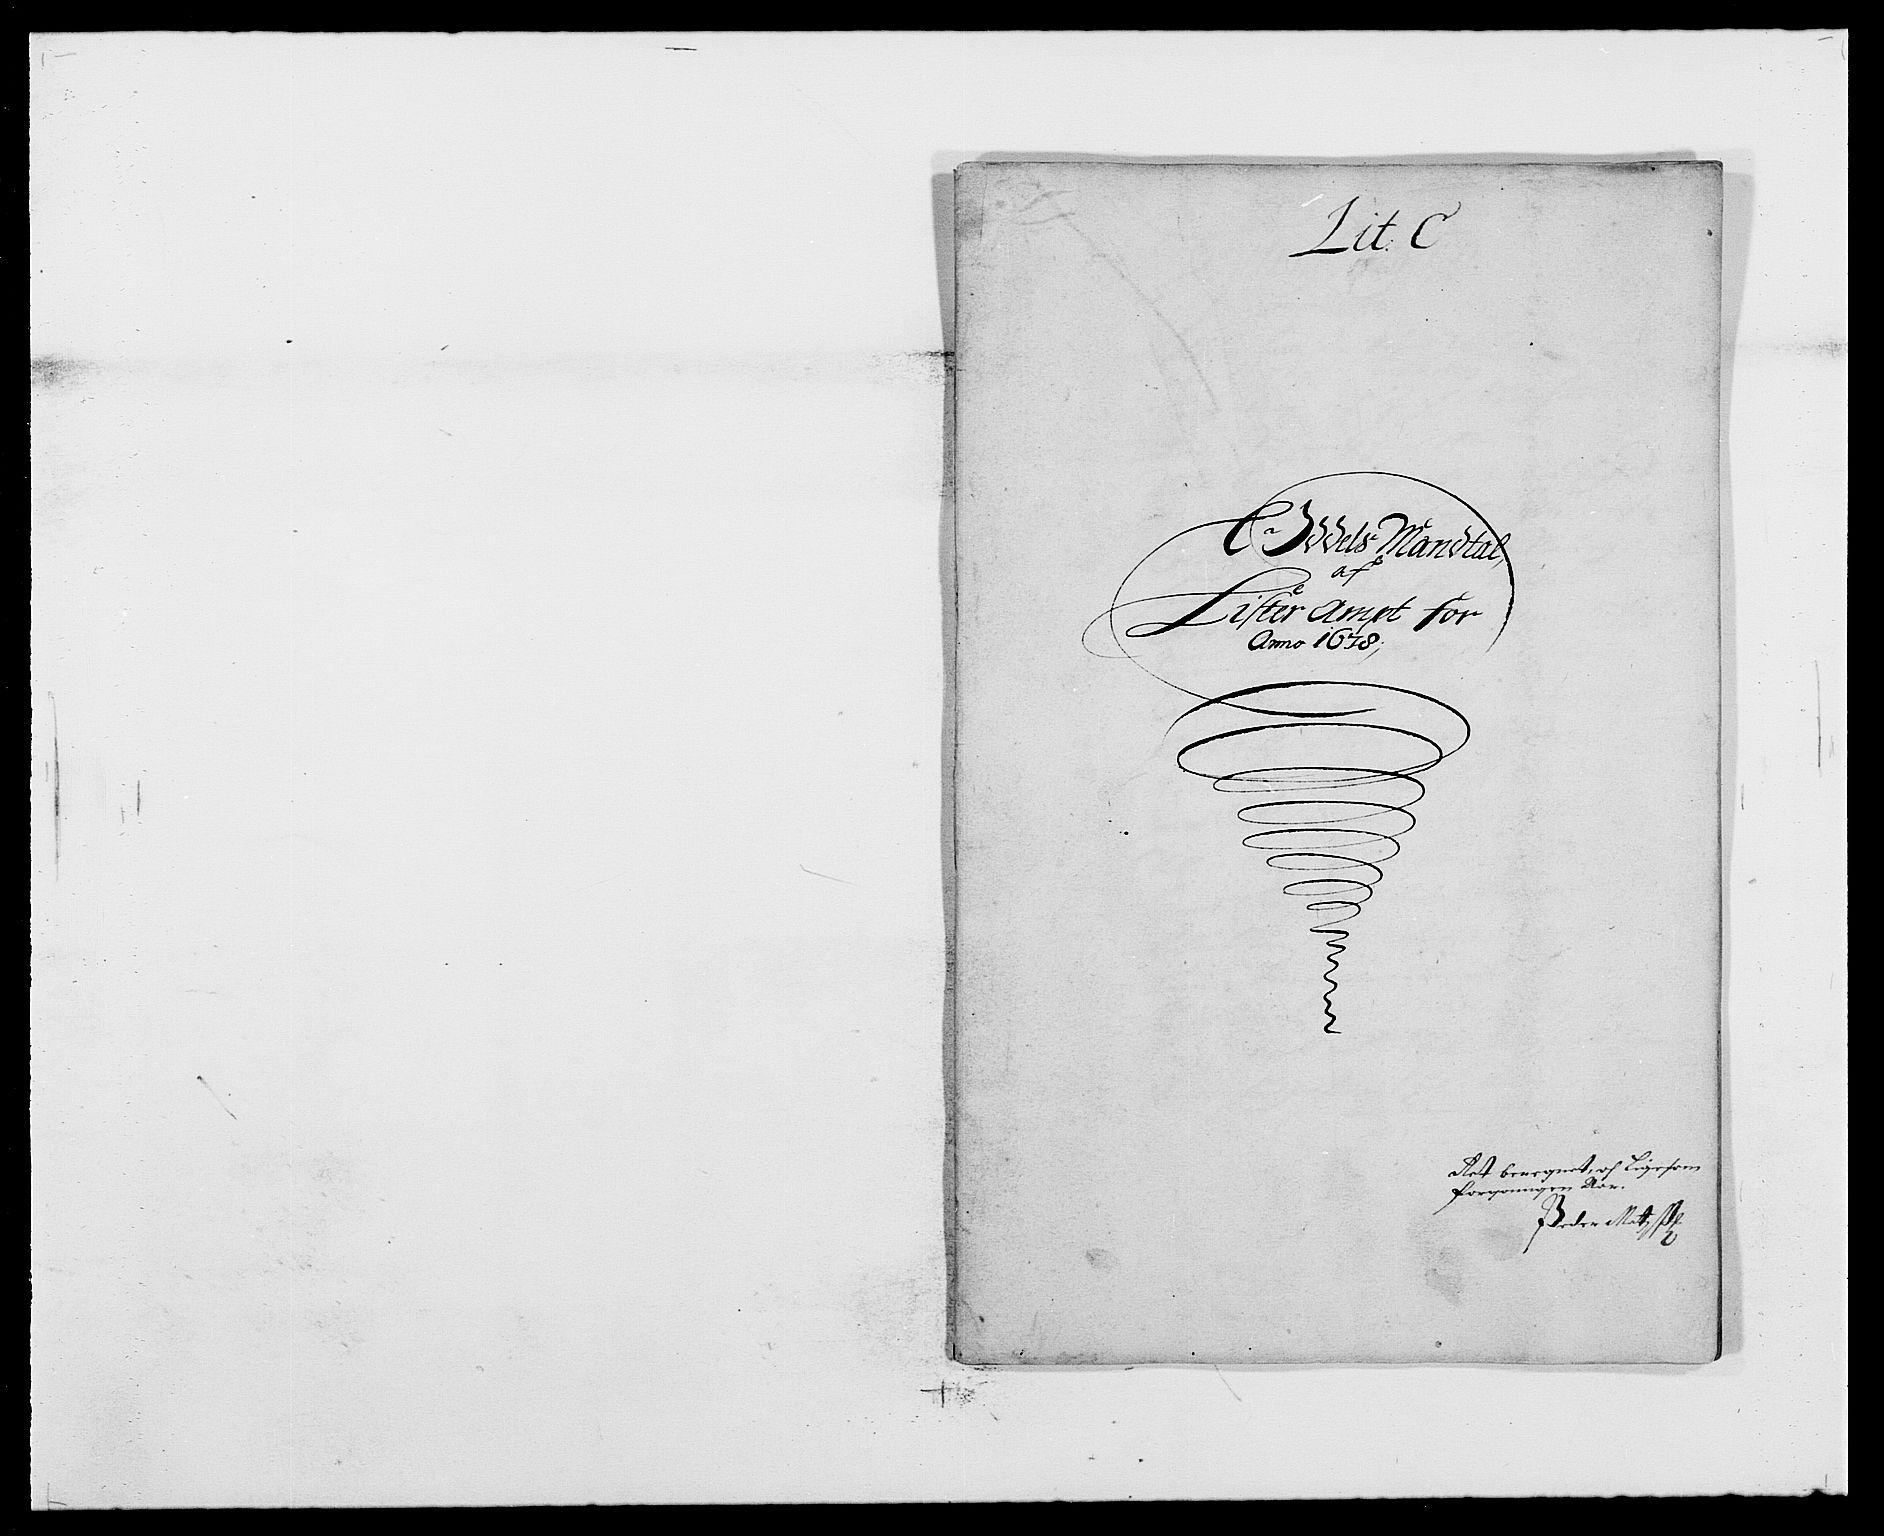 RA, Rentekammeret inntil 1814, Reviderte regnskaper, Fogderegnskap, R41/L2530: Fogderegnskap Lista, 1677-1679, s. 244